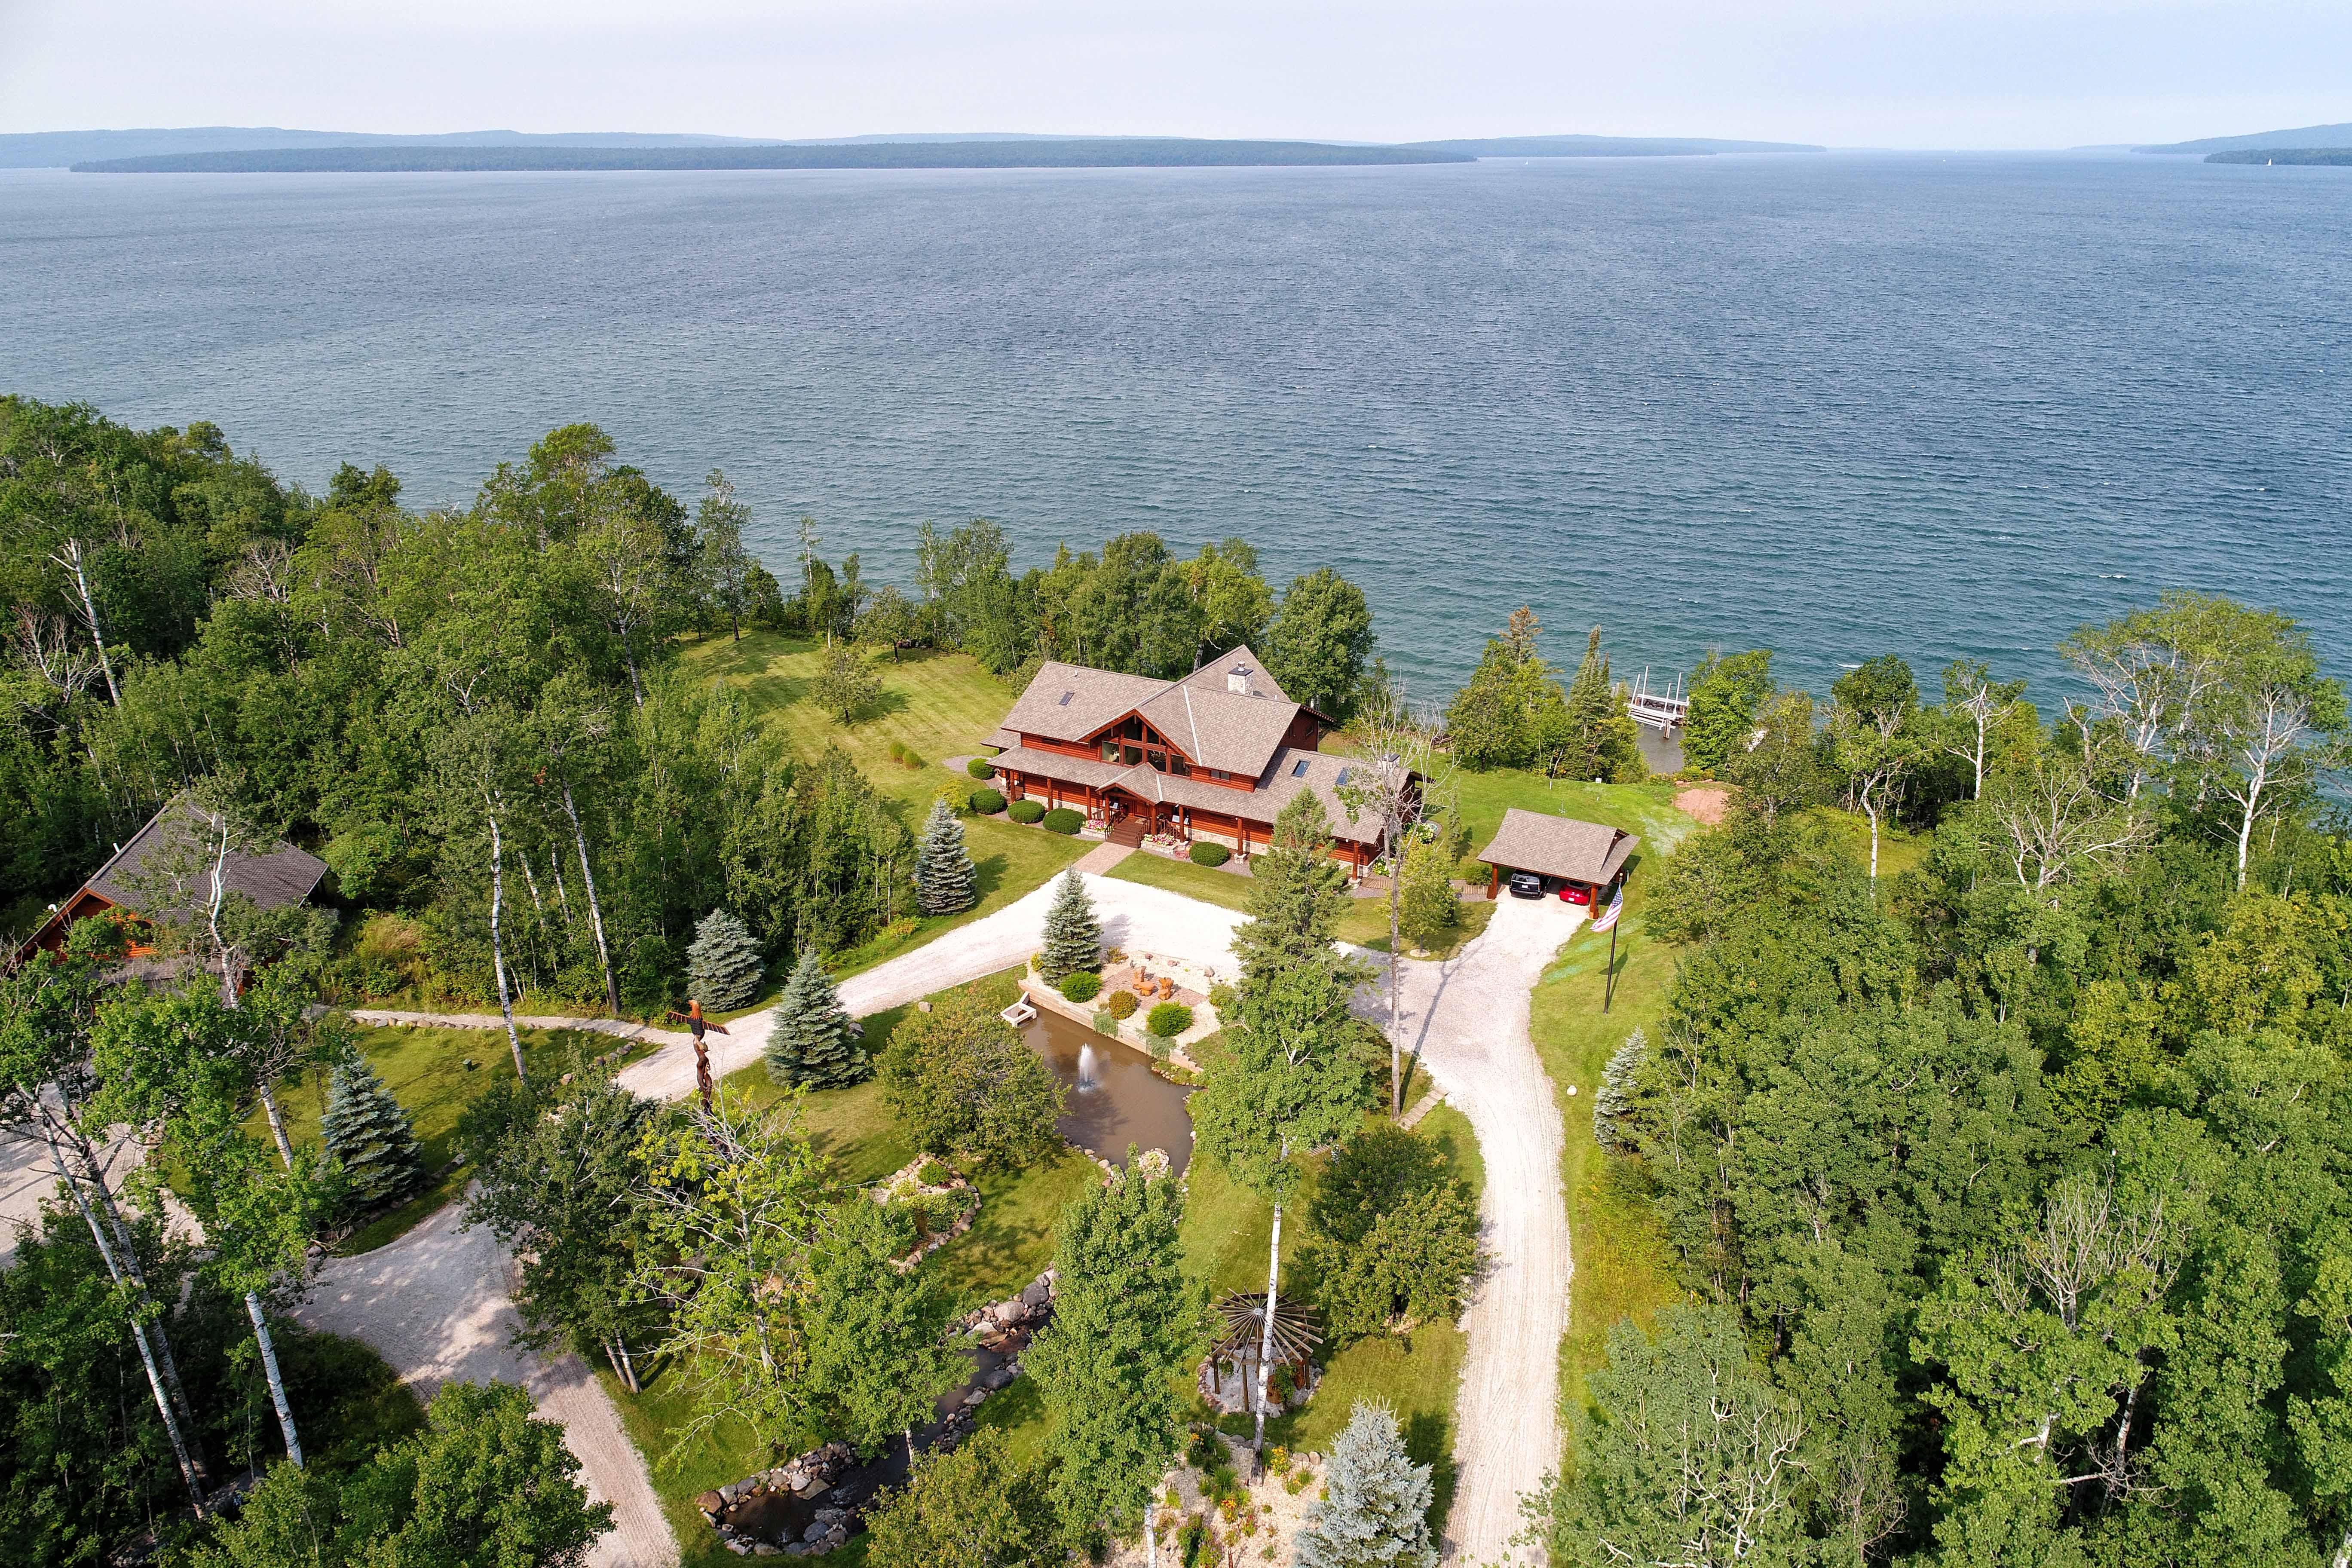 Madeline Island Aerial Photos